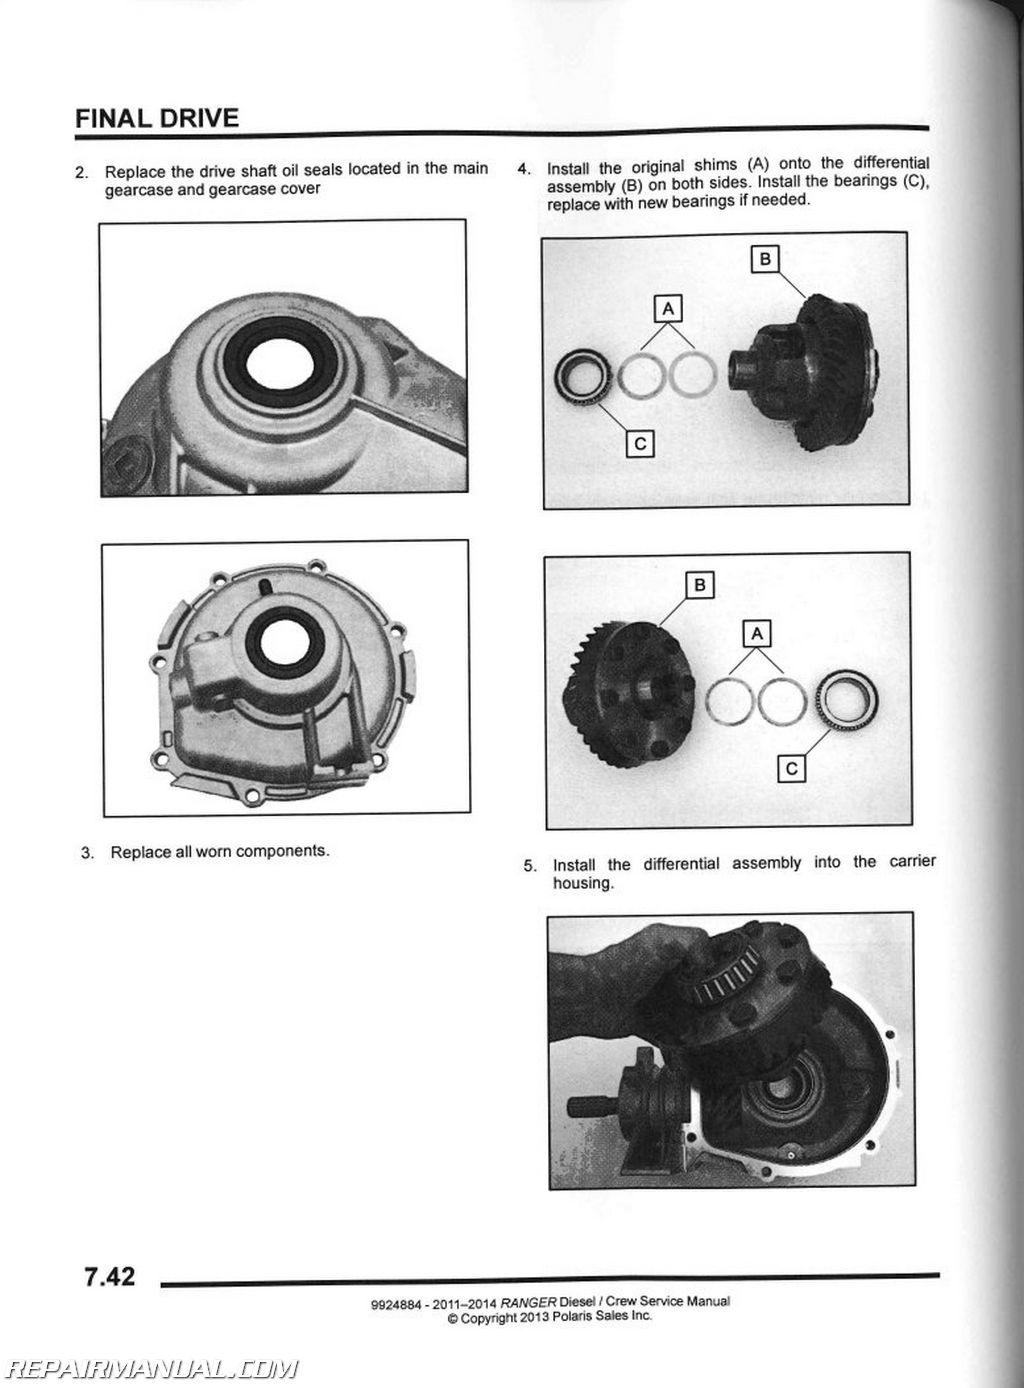 lawn tractor wiring diagram poverty cycle 2011-2014 polaris ranger diesel crew utv service manual